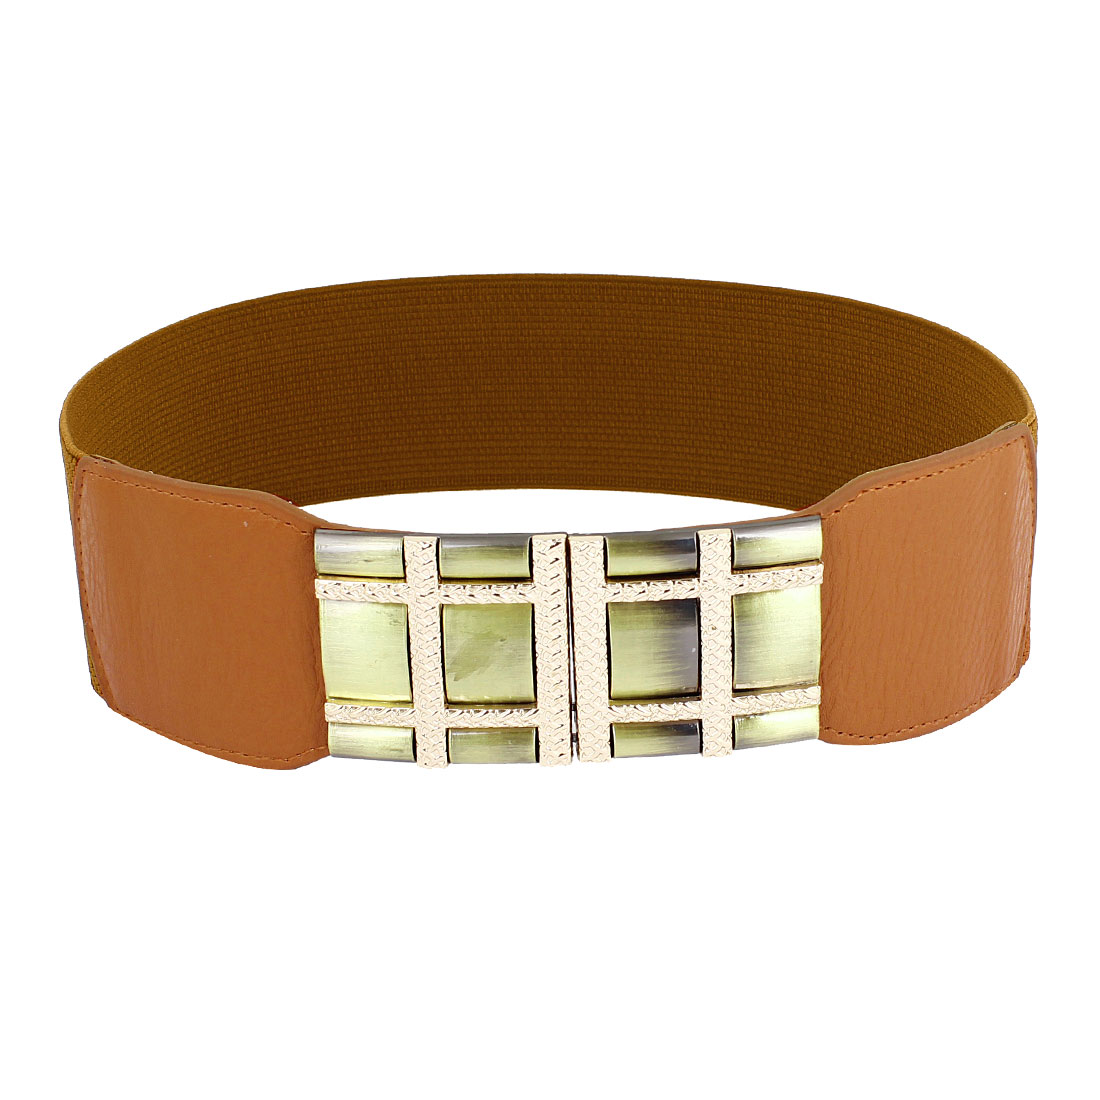 Metal Check Design Interlock Buckle Brown Elastic Waist Band Belt for Lady